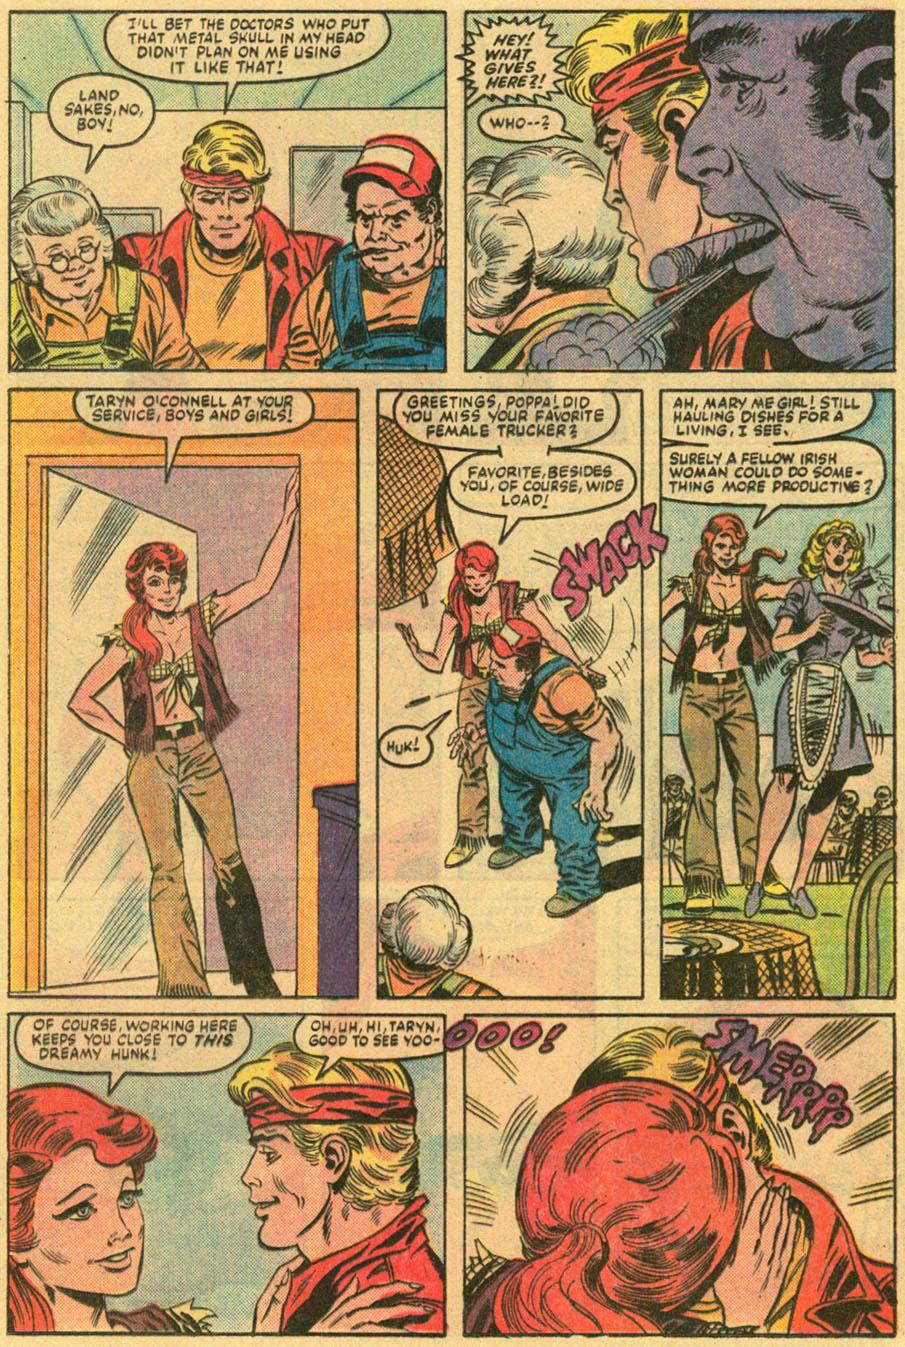 Read online U.S. 1 comic -  Issue #2 - 11